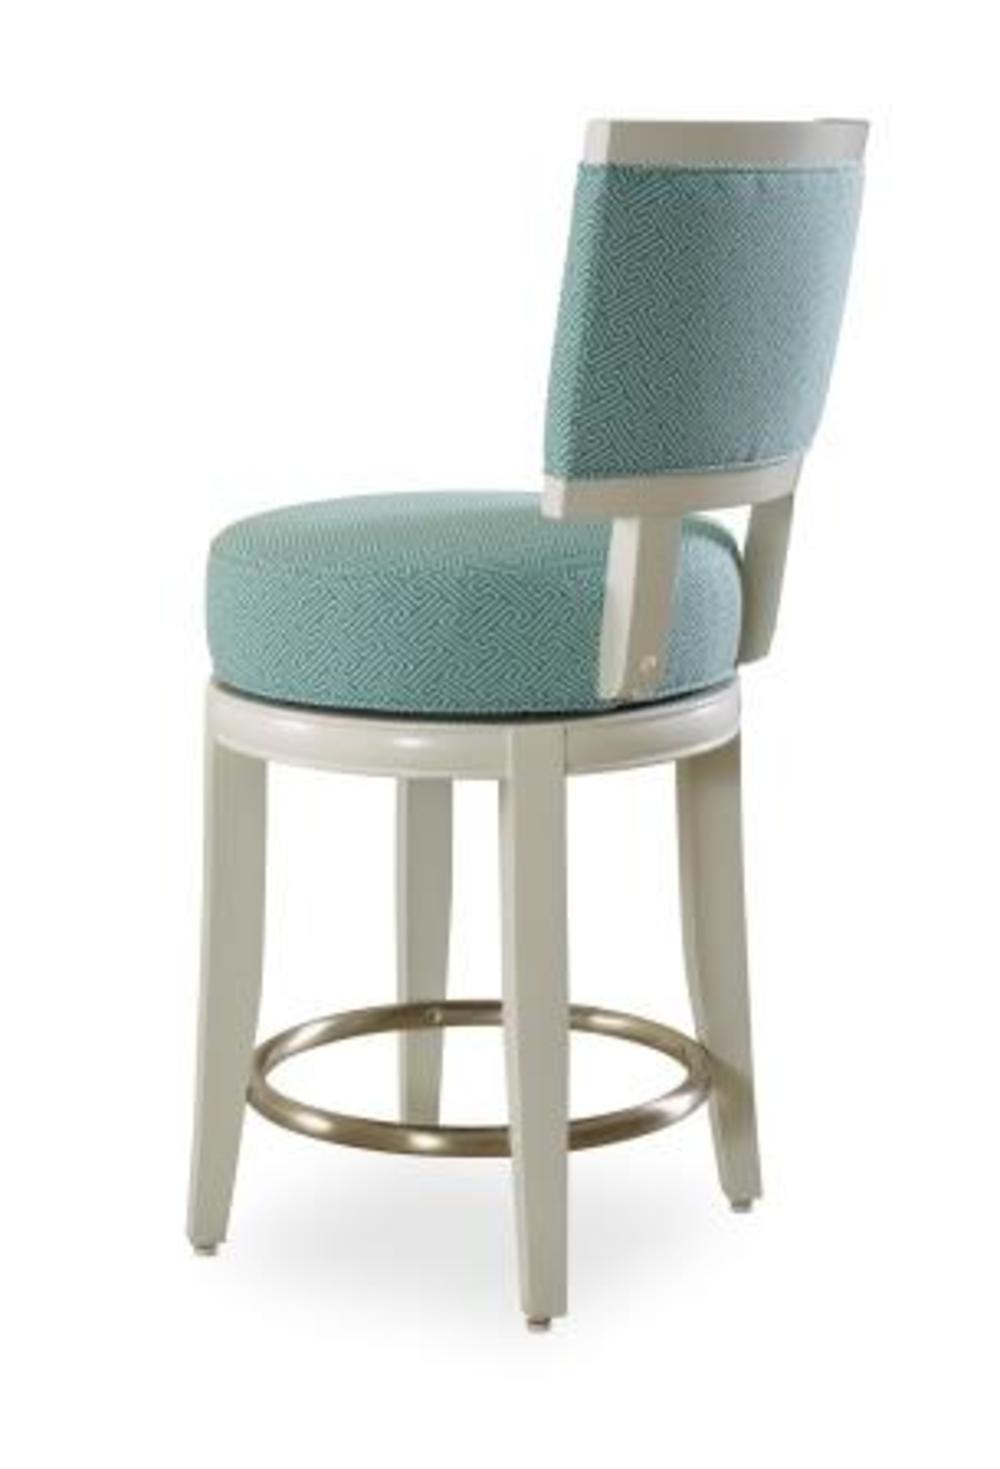 Designmaster Furniture - Bartlett Counter Stool